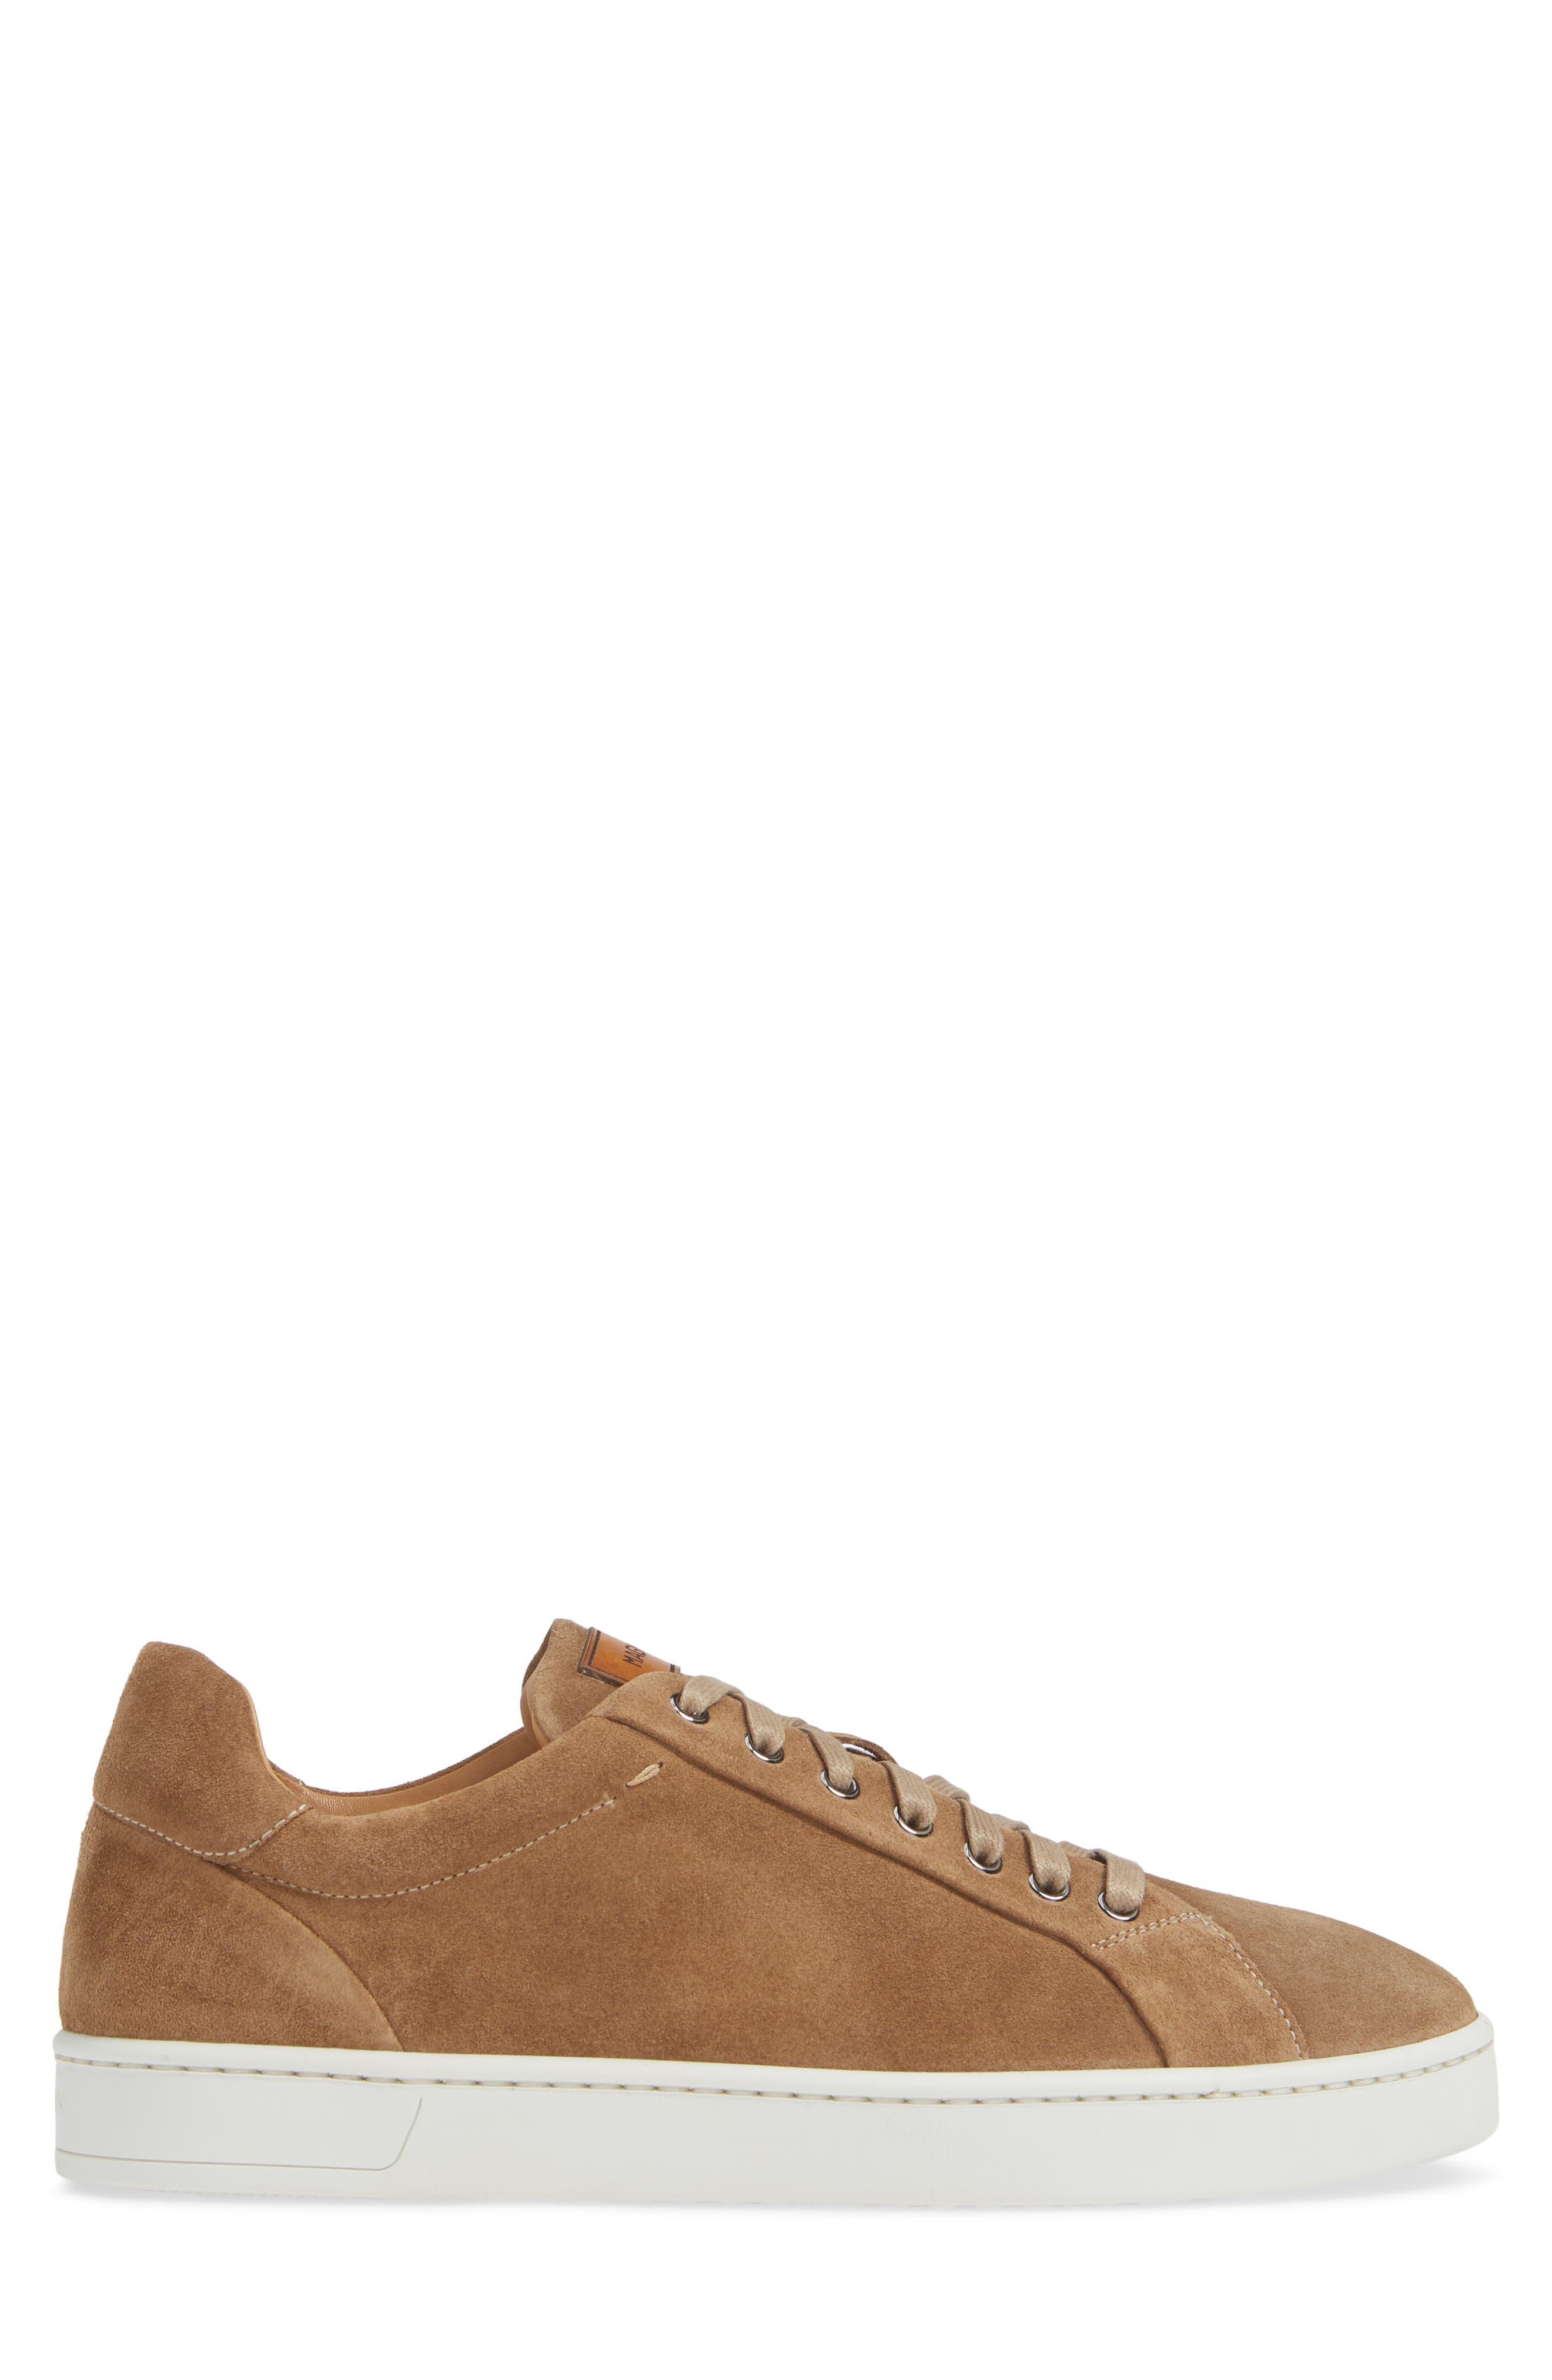 Elonso Low Top Sneaker,                             Alternate thumbnail 3, color,                             CASTORO LEATHER